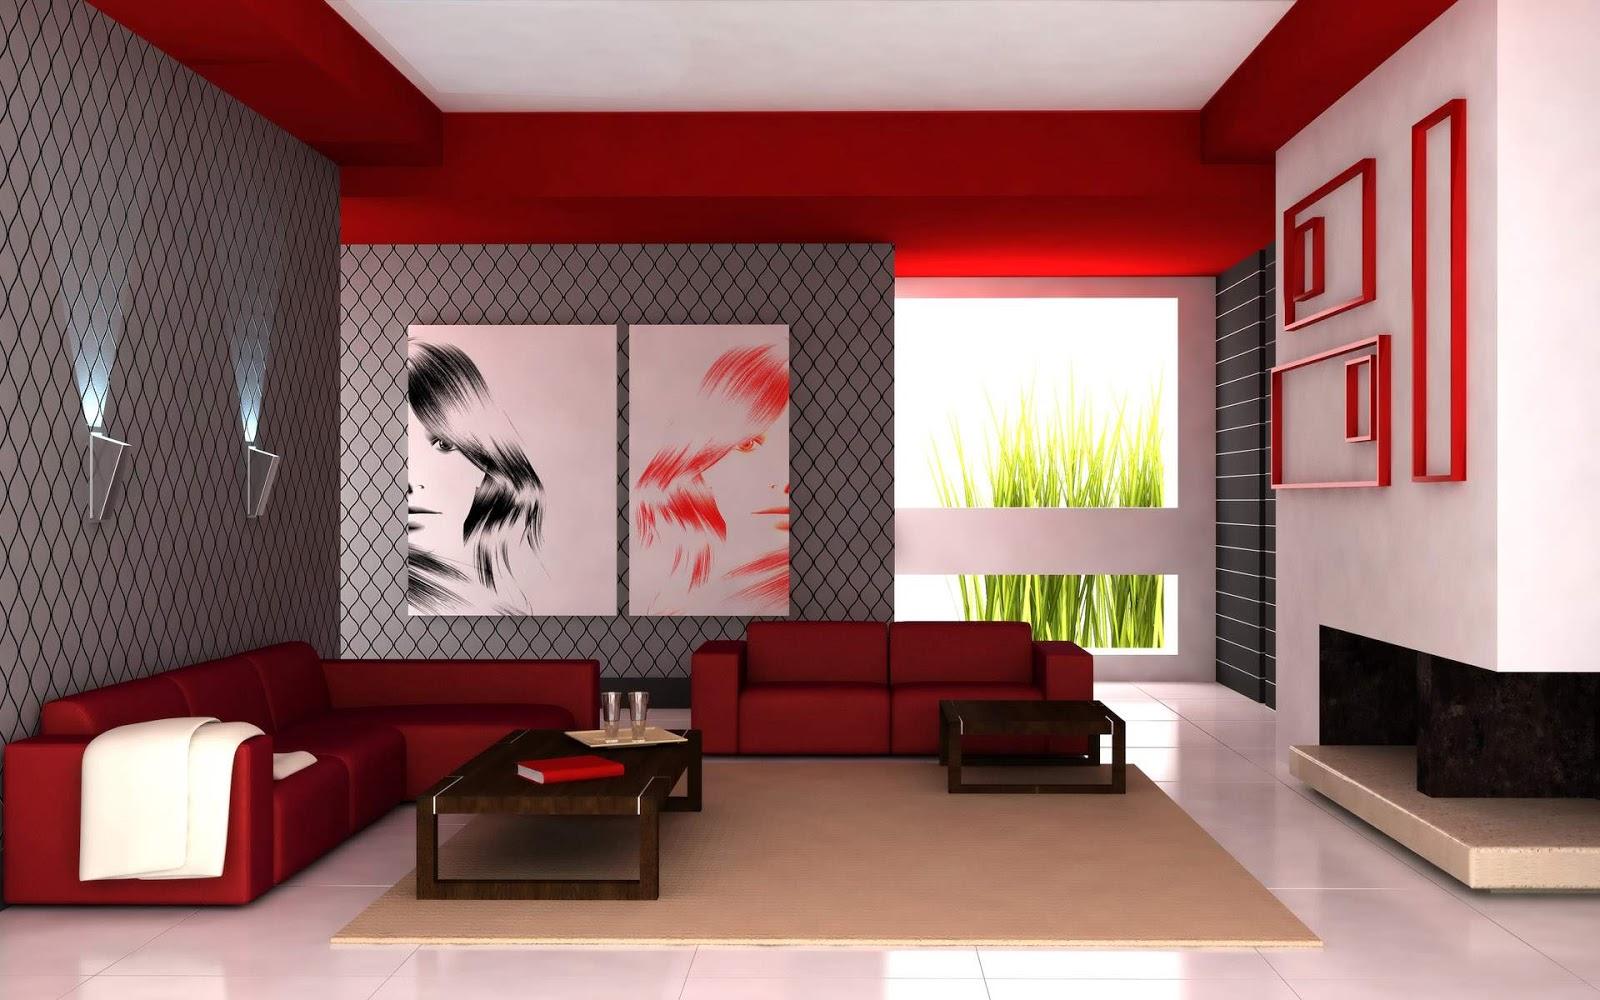 Interior Design Home Decor Zampco - Home decor interior design